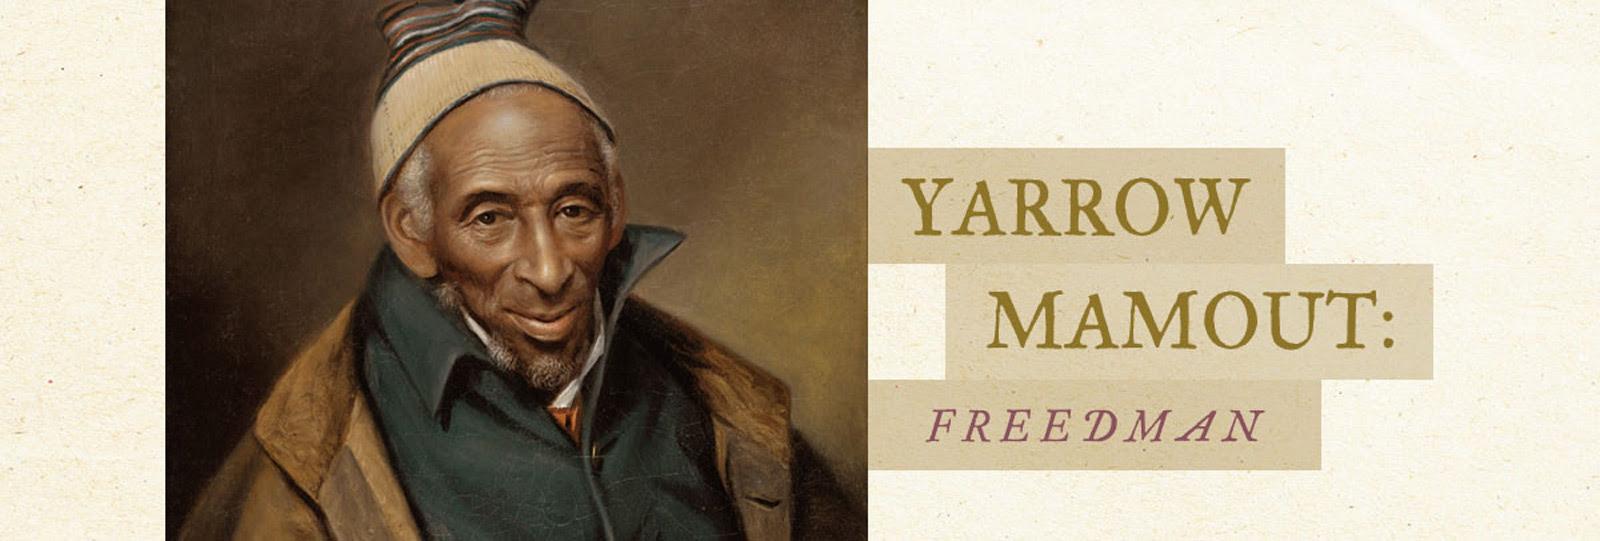 Yarrow Mamout: Freedman